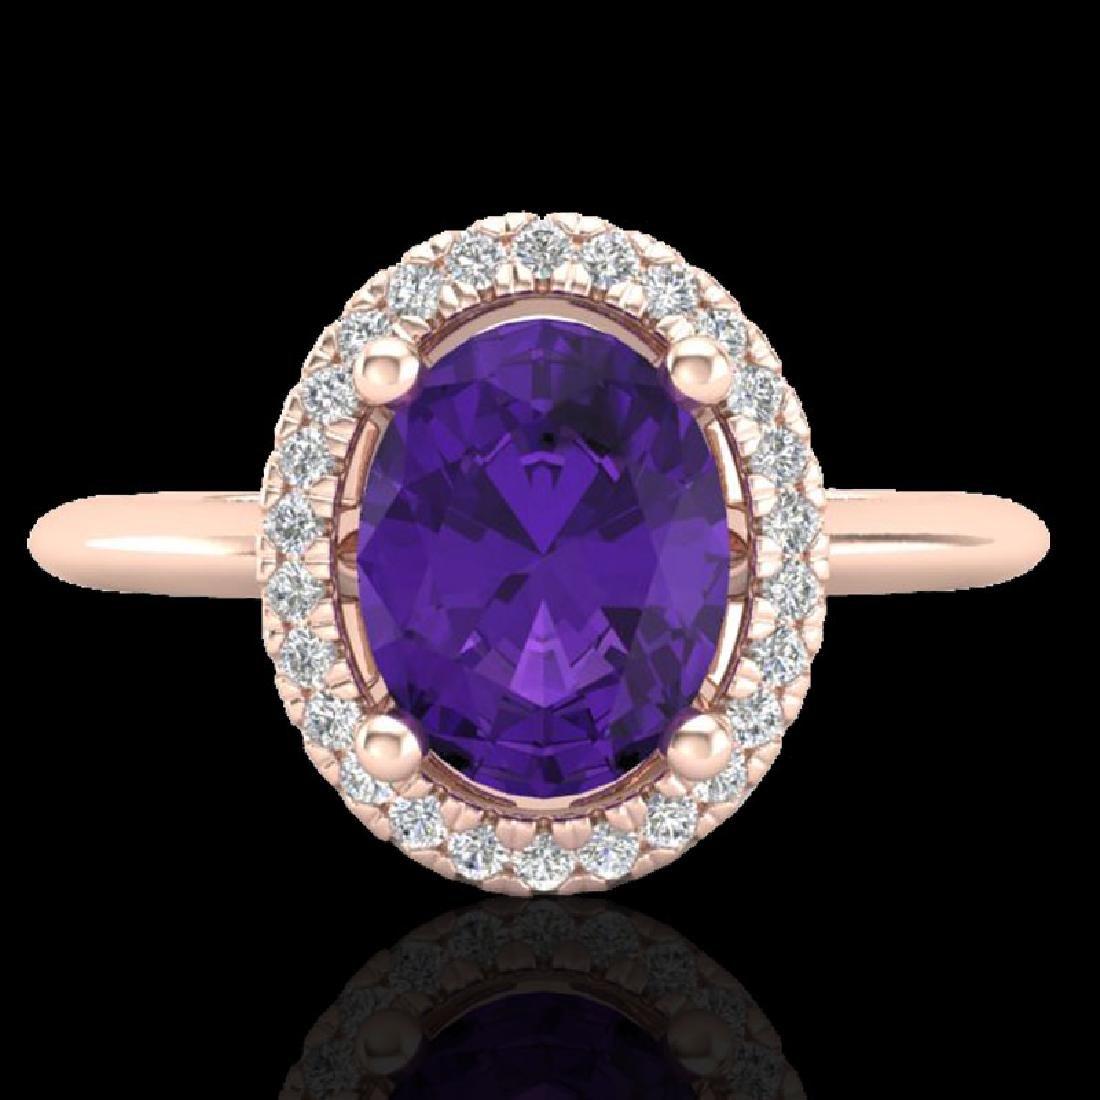 1.75 CTW Amethyst & Micro VS/SI Diamond Ring Solitaire